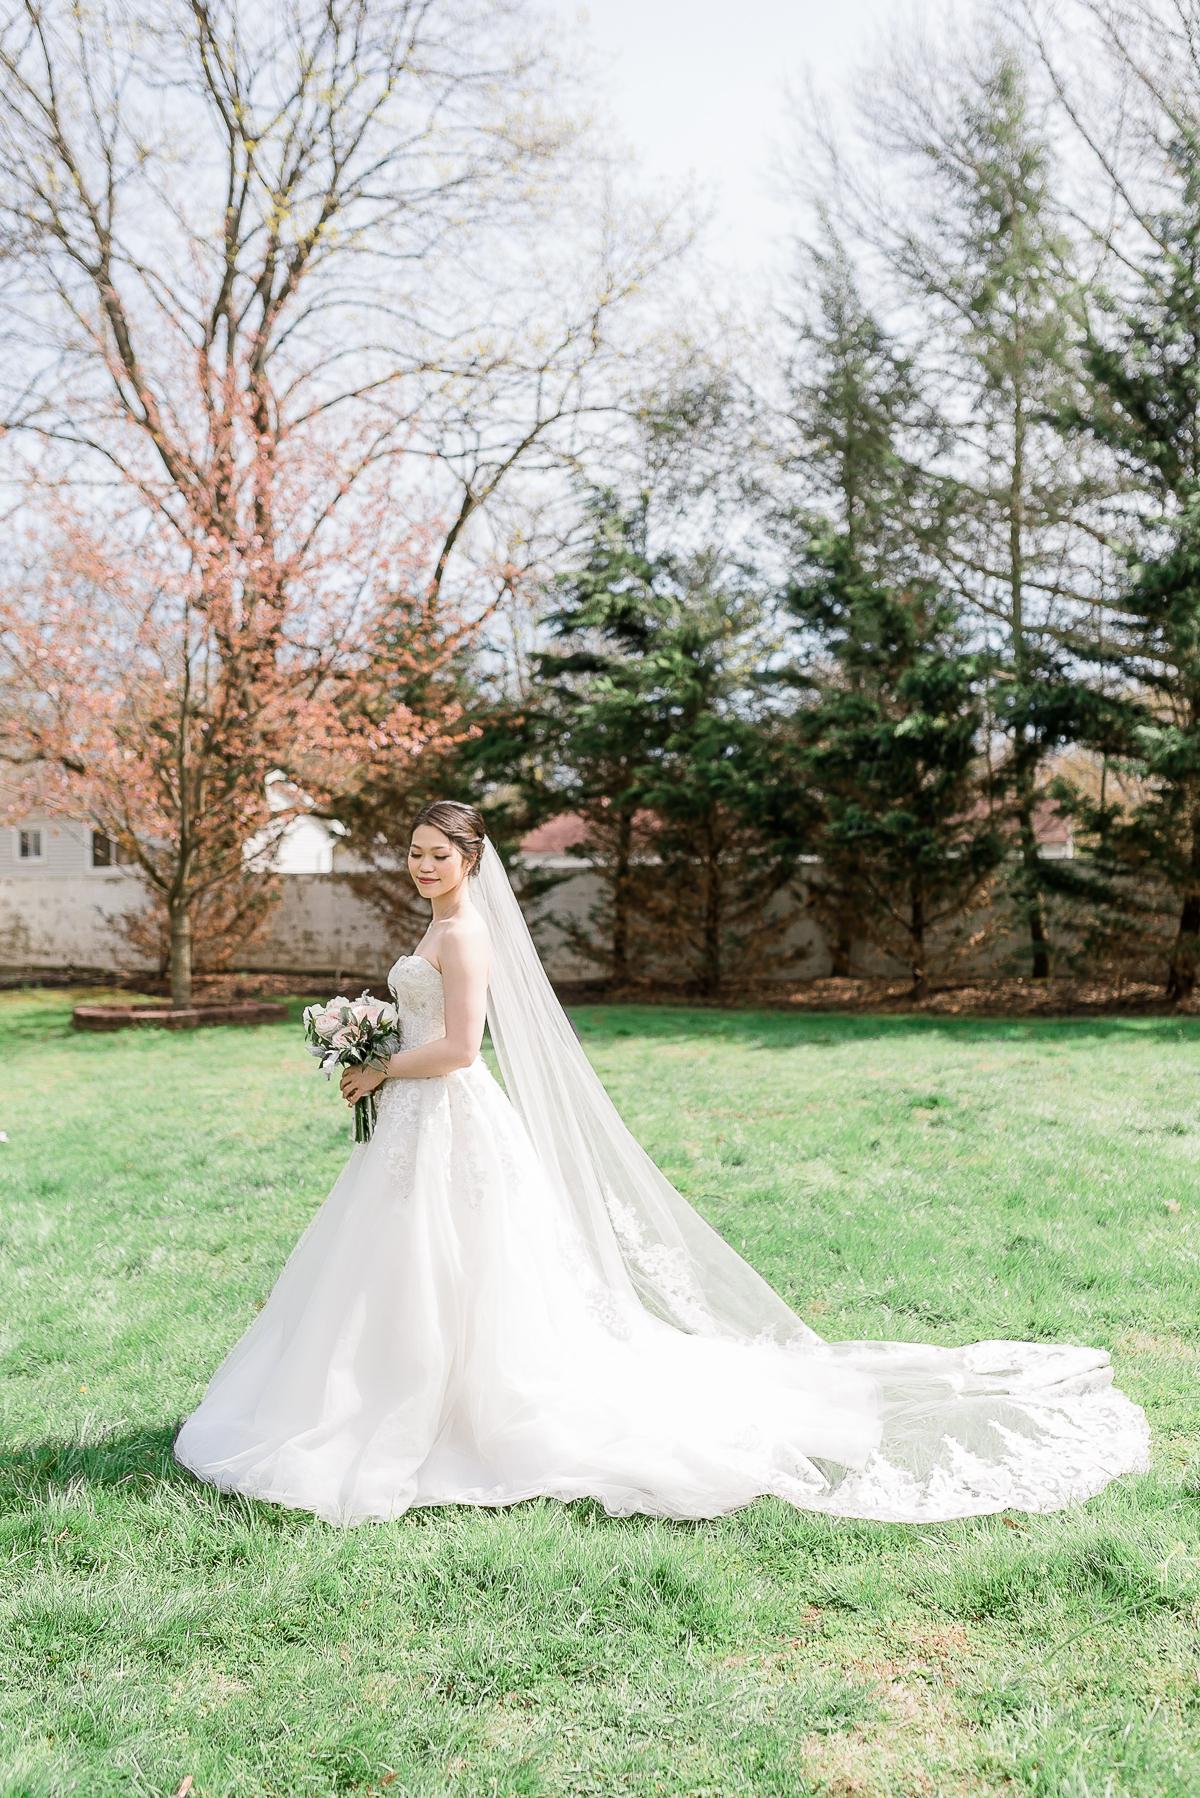 MD-Wedding-Columbia-Inn-Hollywood-Ballroom-Bridal-Party-46.jpg